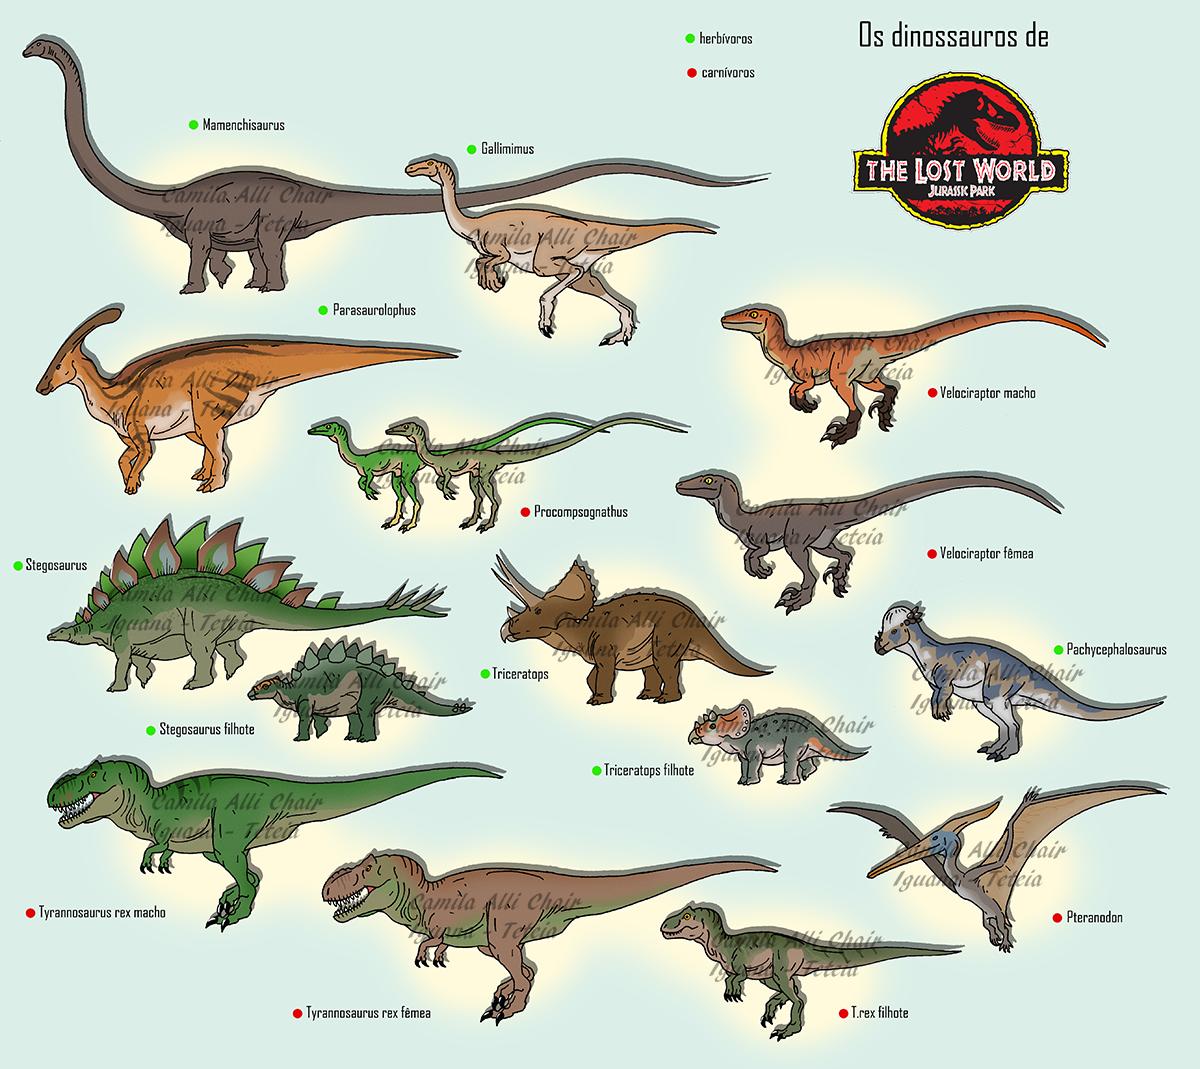 The Lost World Dinosaurs By FreakyRaptor On DeviantArt